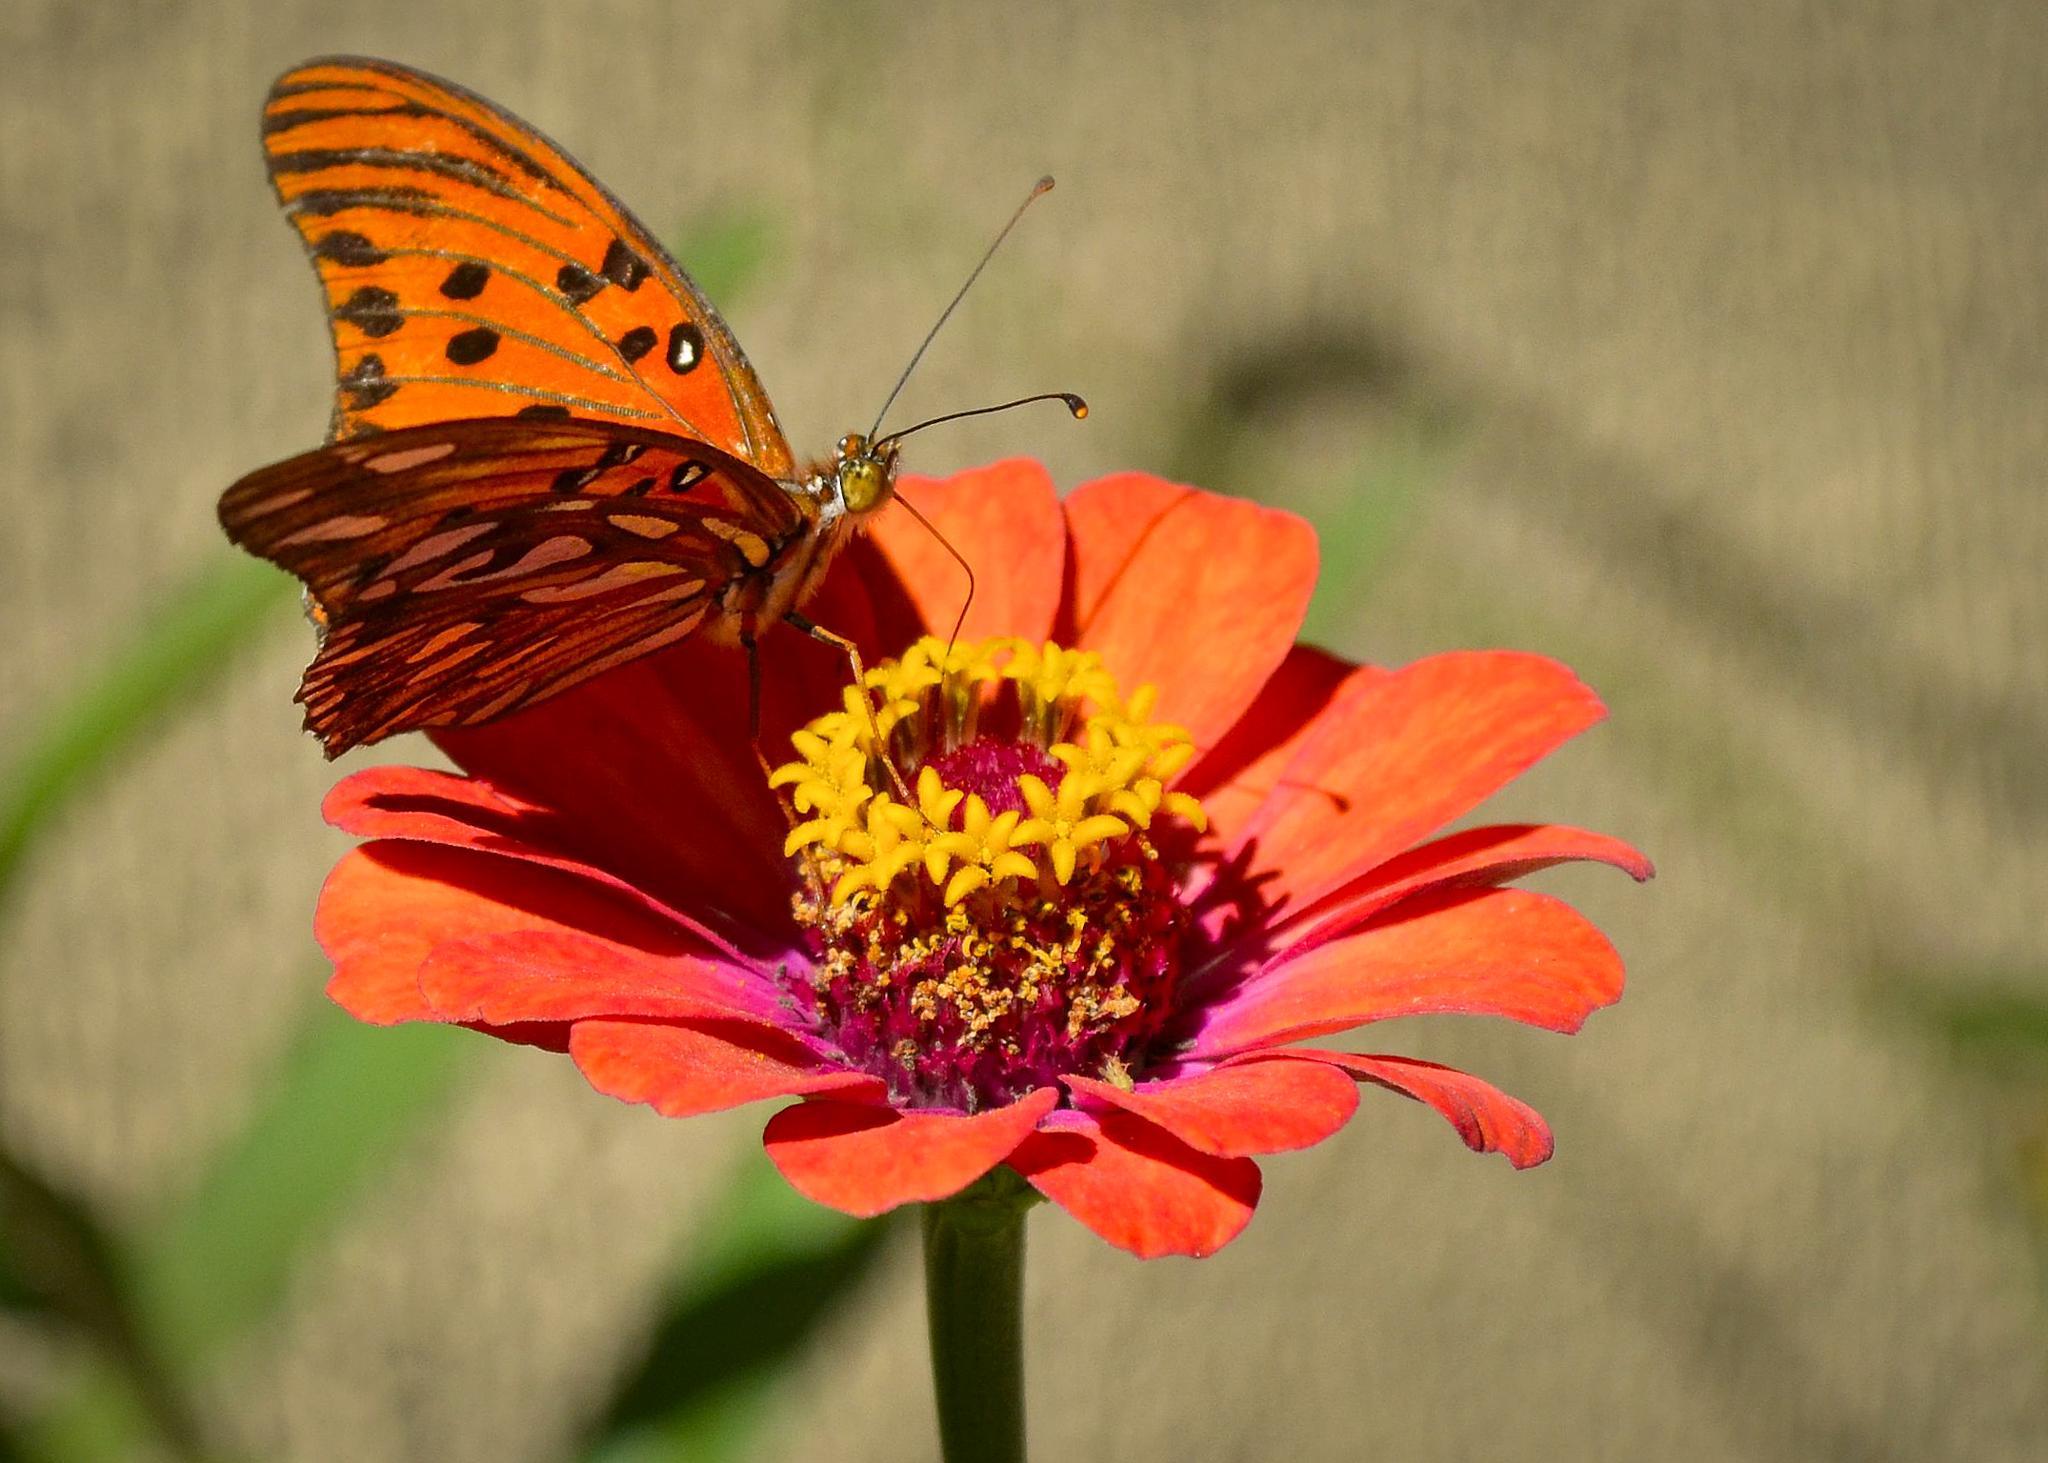 Belezas da natureza 2 by Wilson Silva